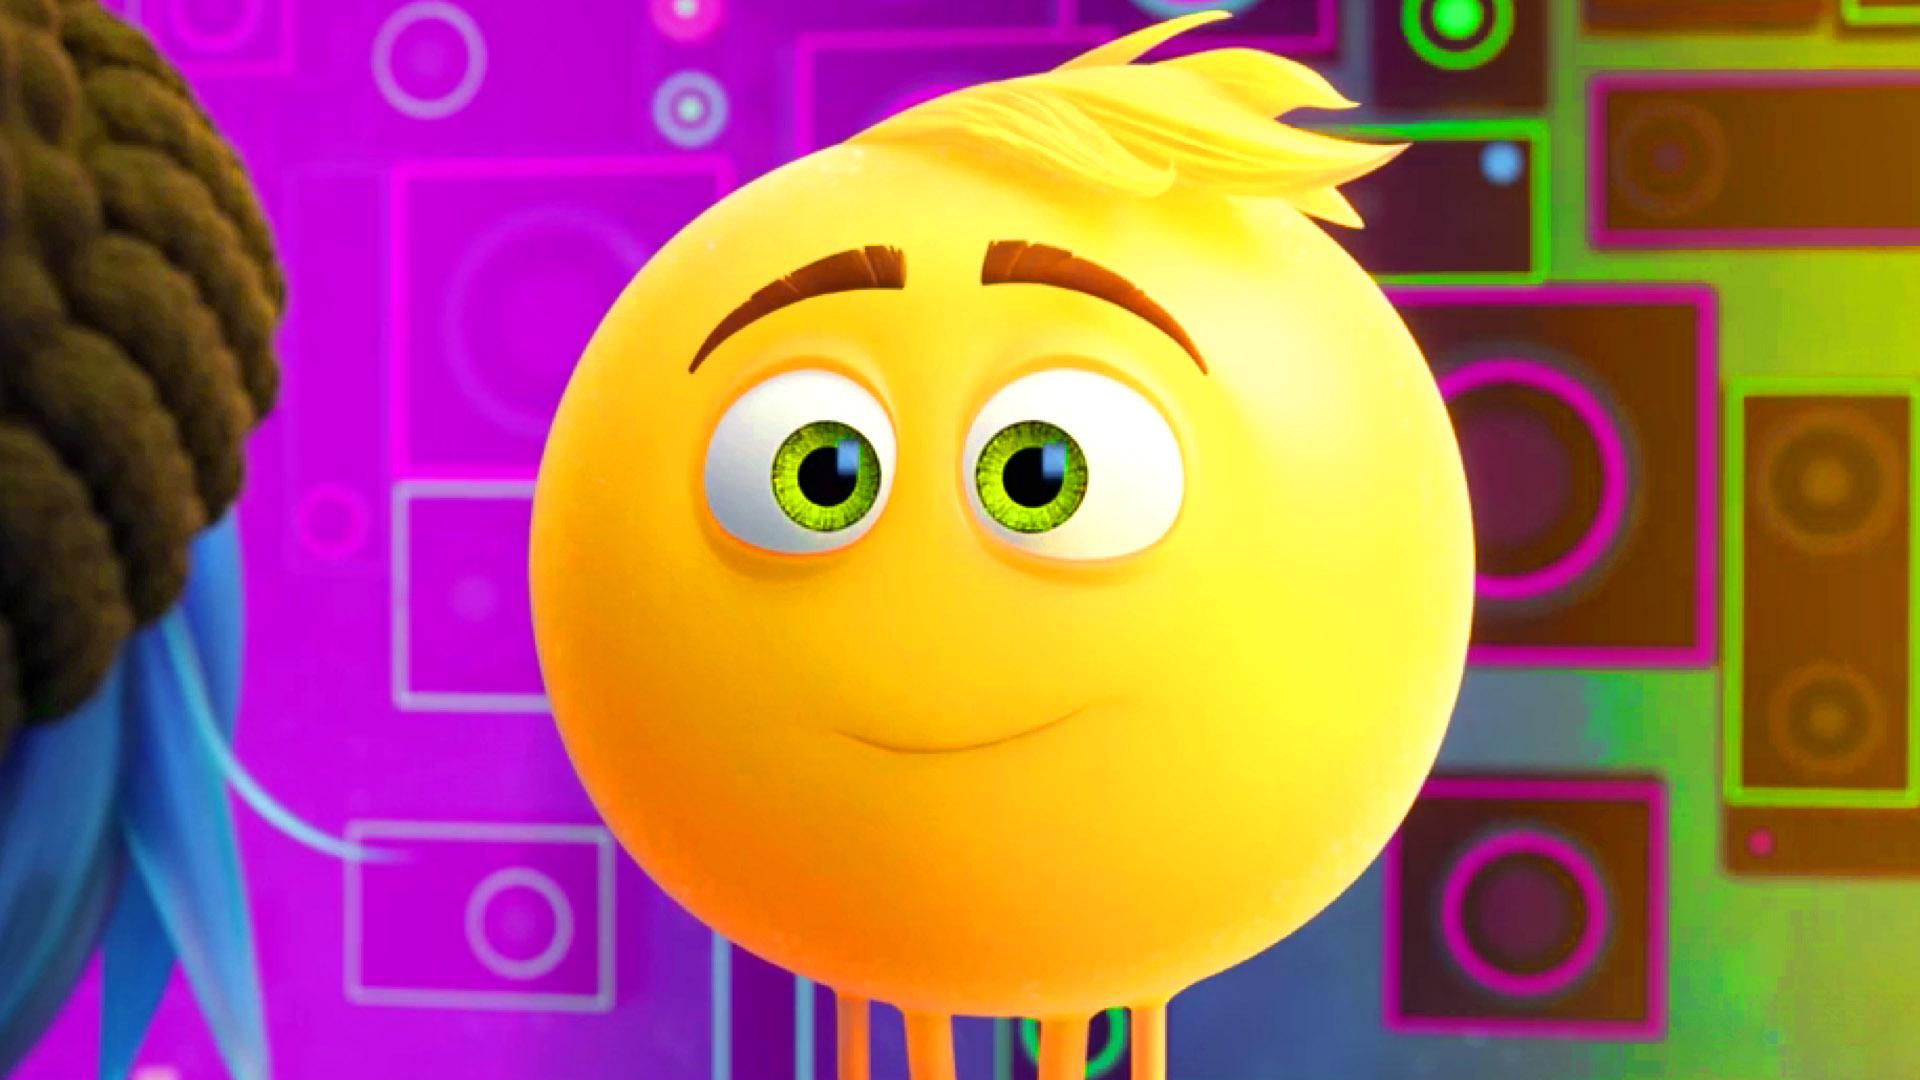 Wallpaper Sioux Falls The Emoji Movie 2017 Fandango